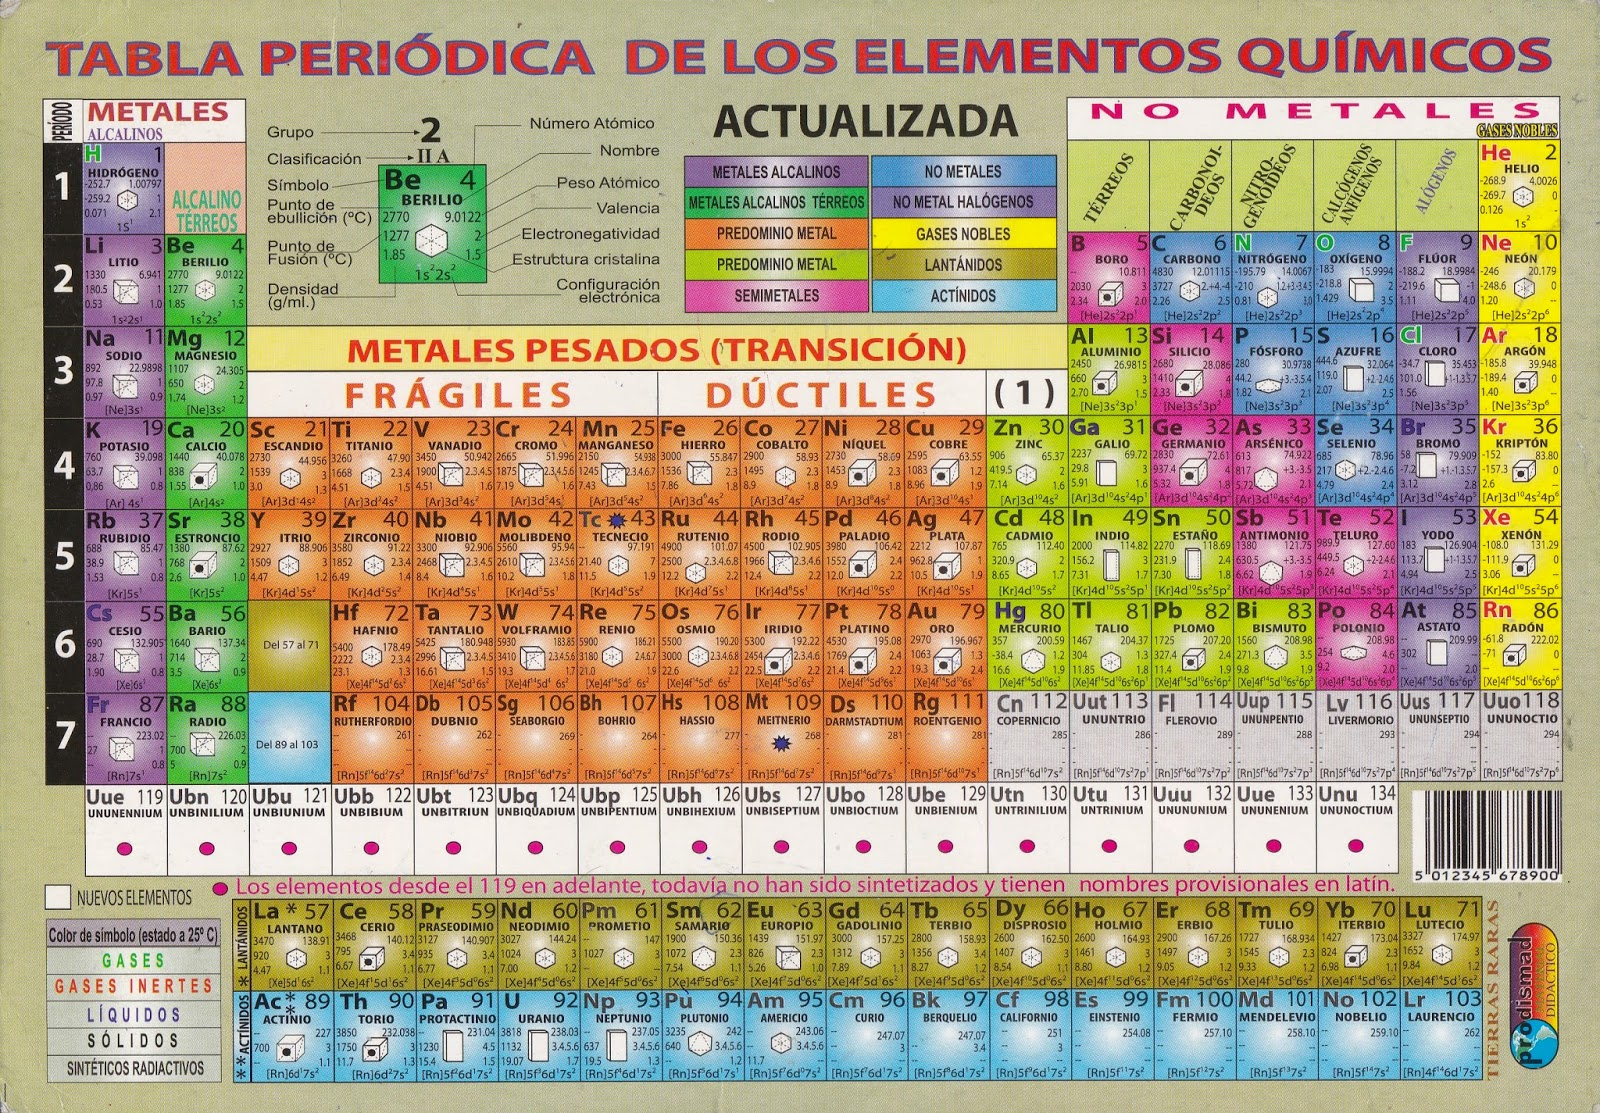 fotografas de una tabla peridica actualizada - Tabla Periodic Actualizada